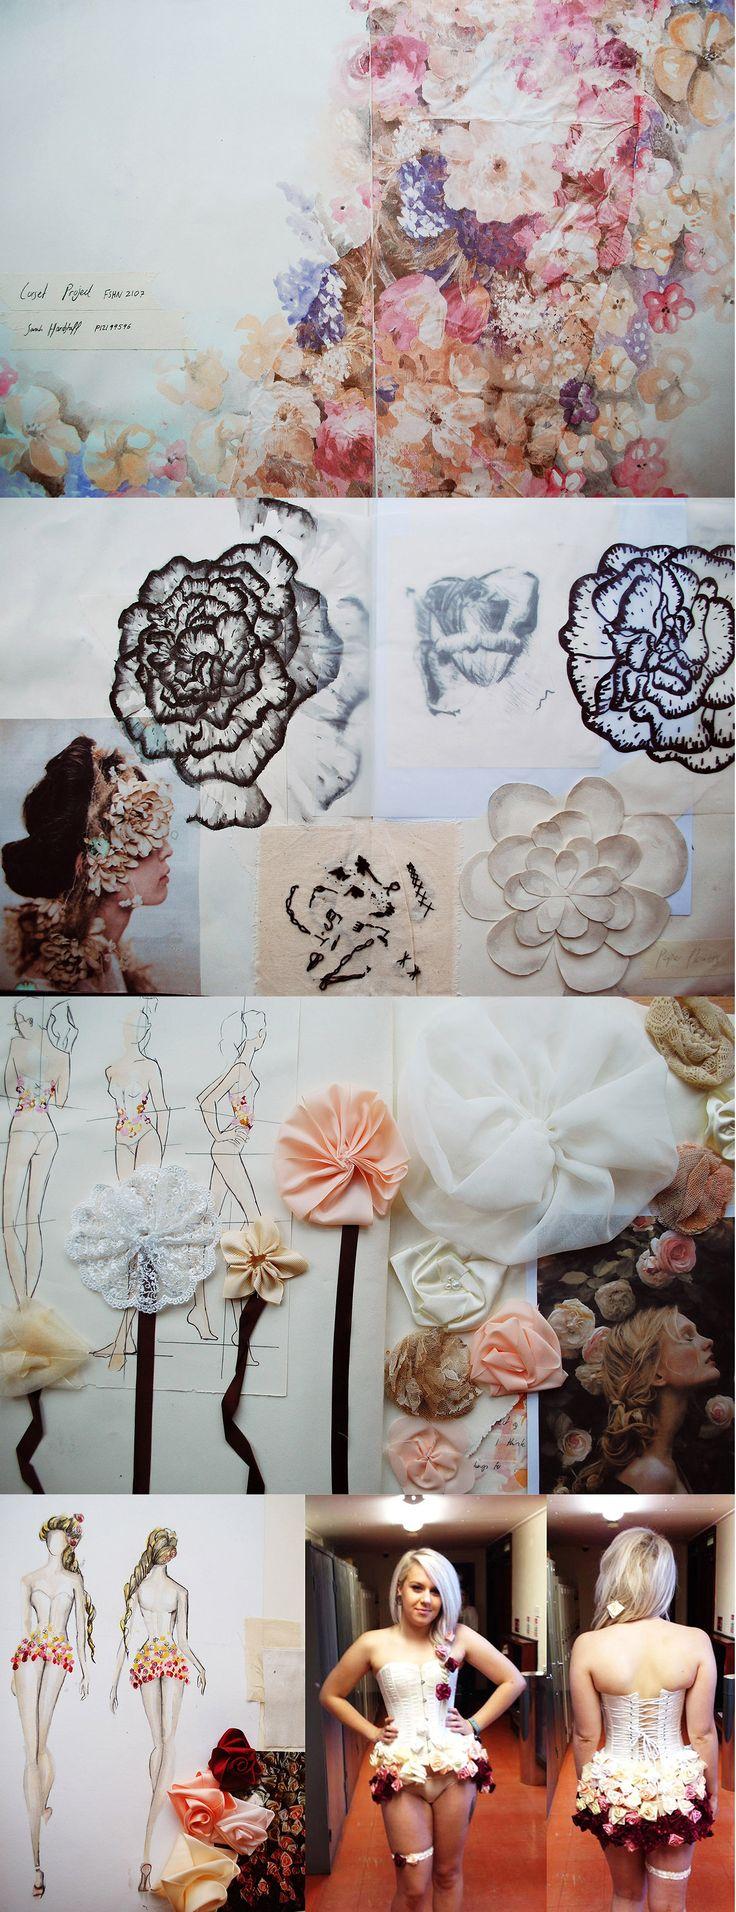 Contour Fashion Portfolio - corset project, fashion design  development - fashion sketchbook, research, illustrations, fabric flower samples  final design // Sarah Elizabeth